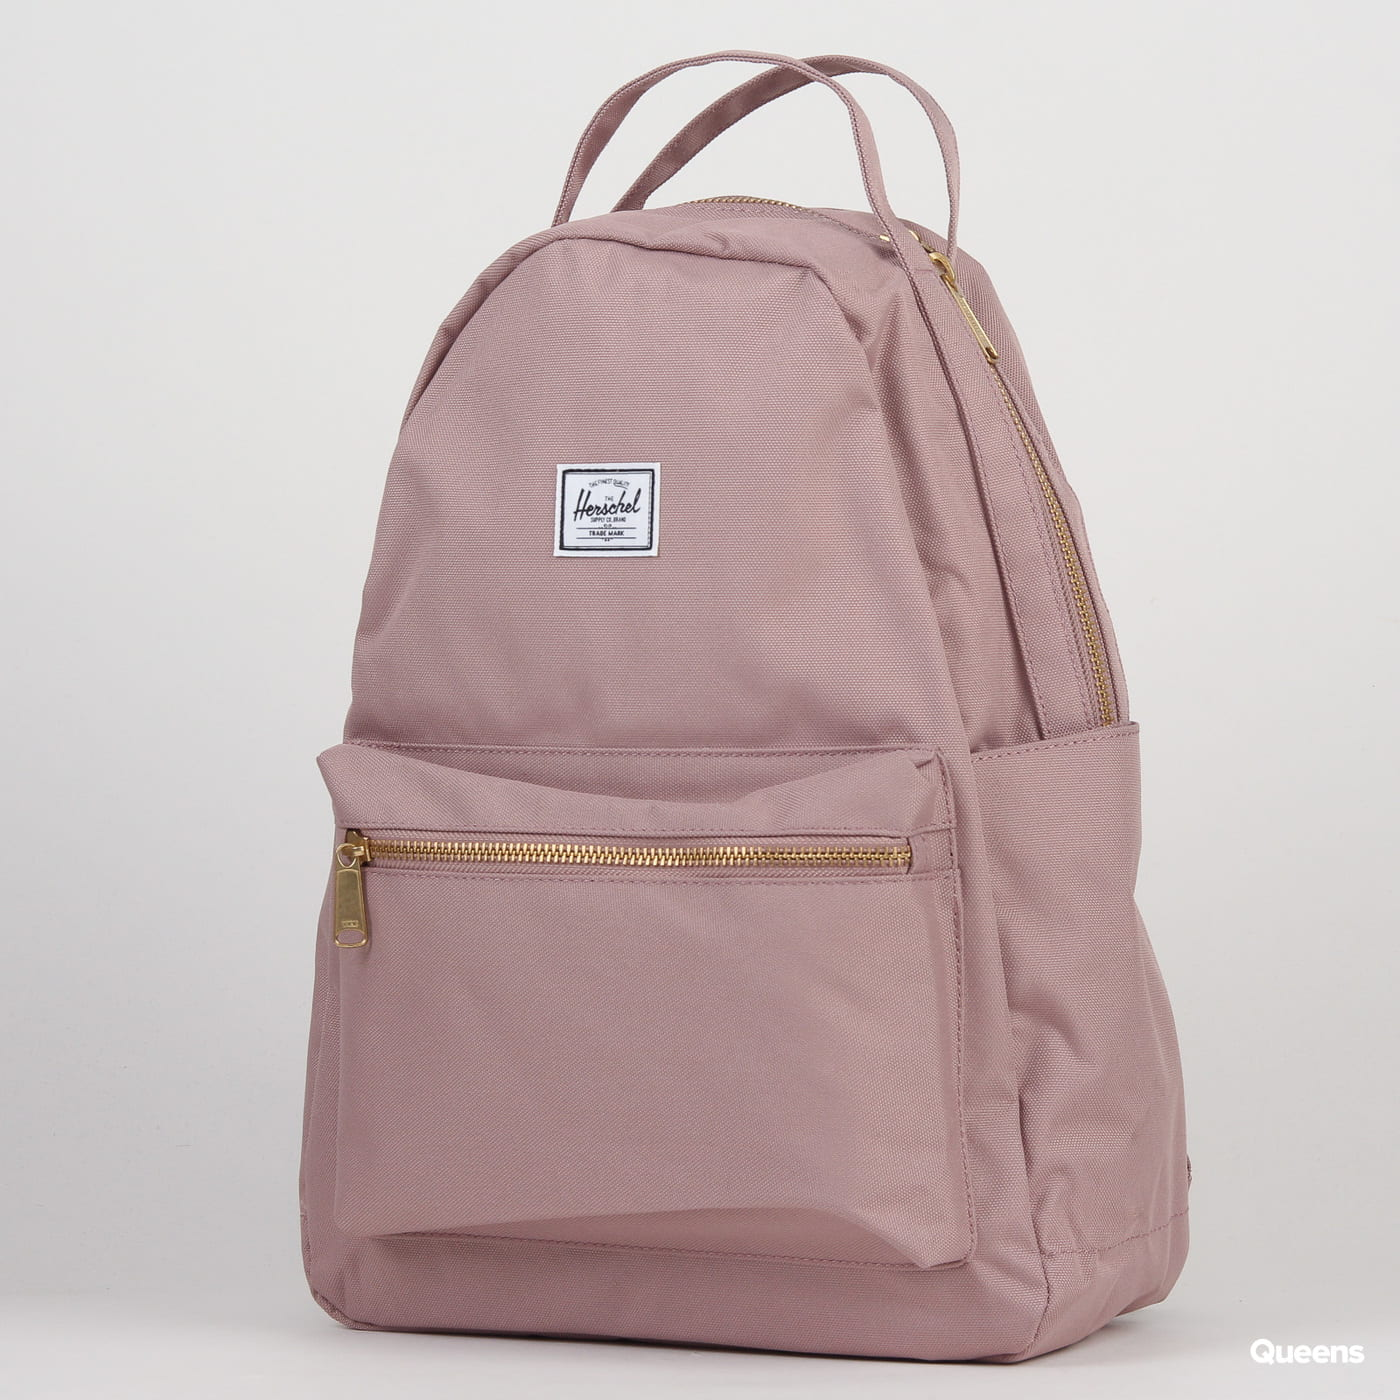 The Herschel Supply CO. Nova Mid Backpack svetlofialový